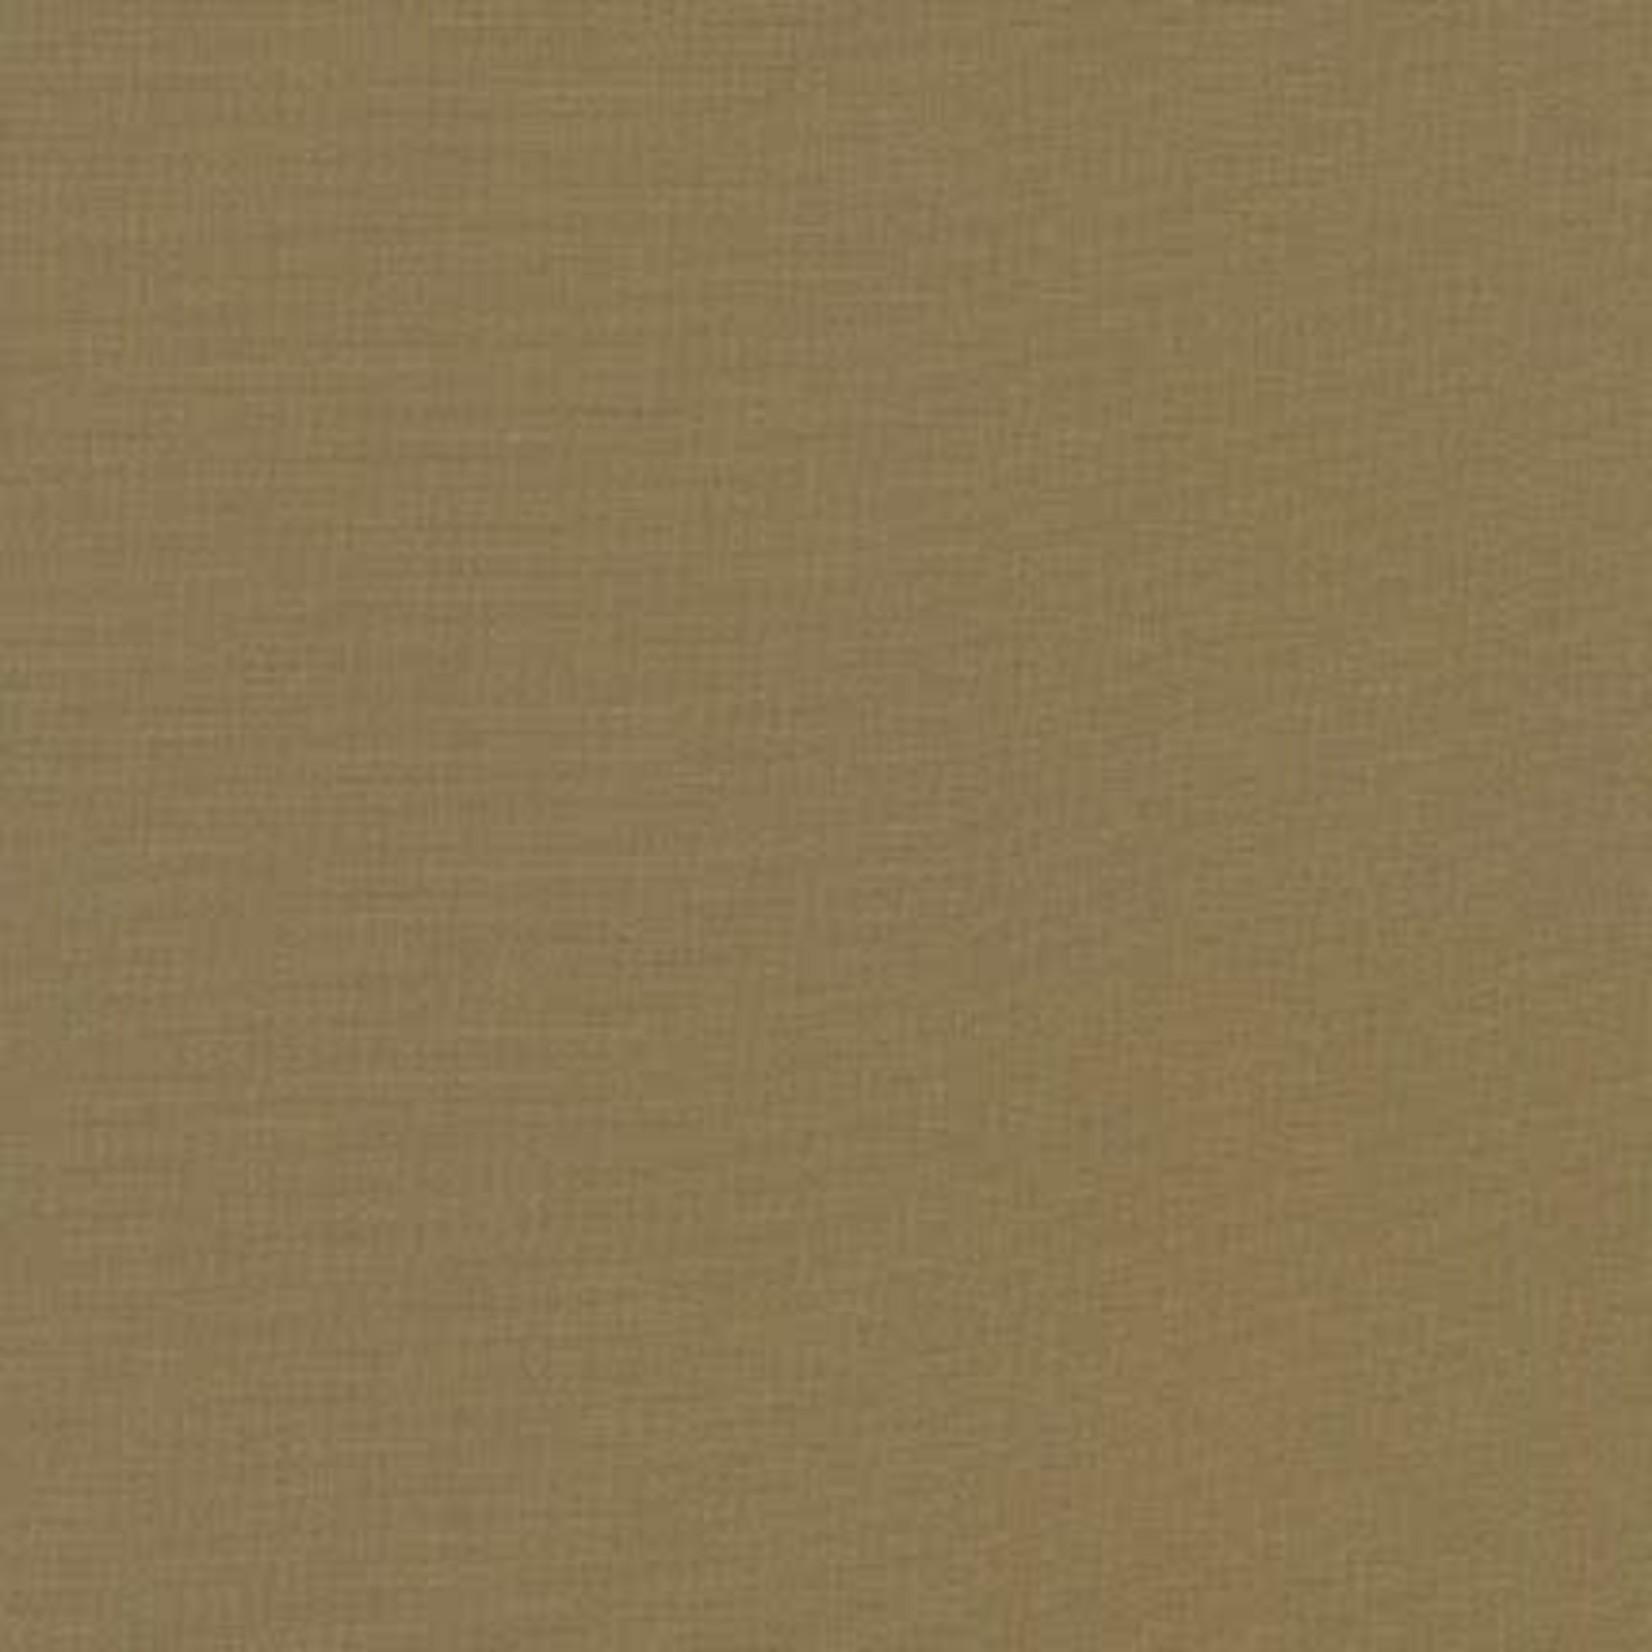 KONA KONA  K001-340 HERB, PER CM OR $14/M